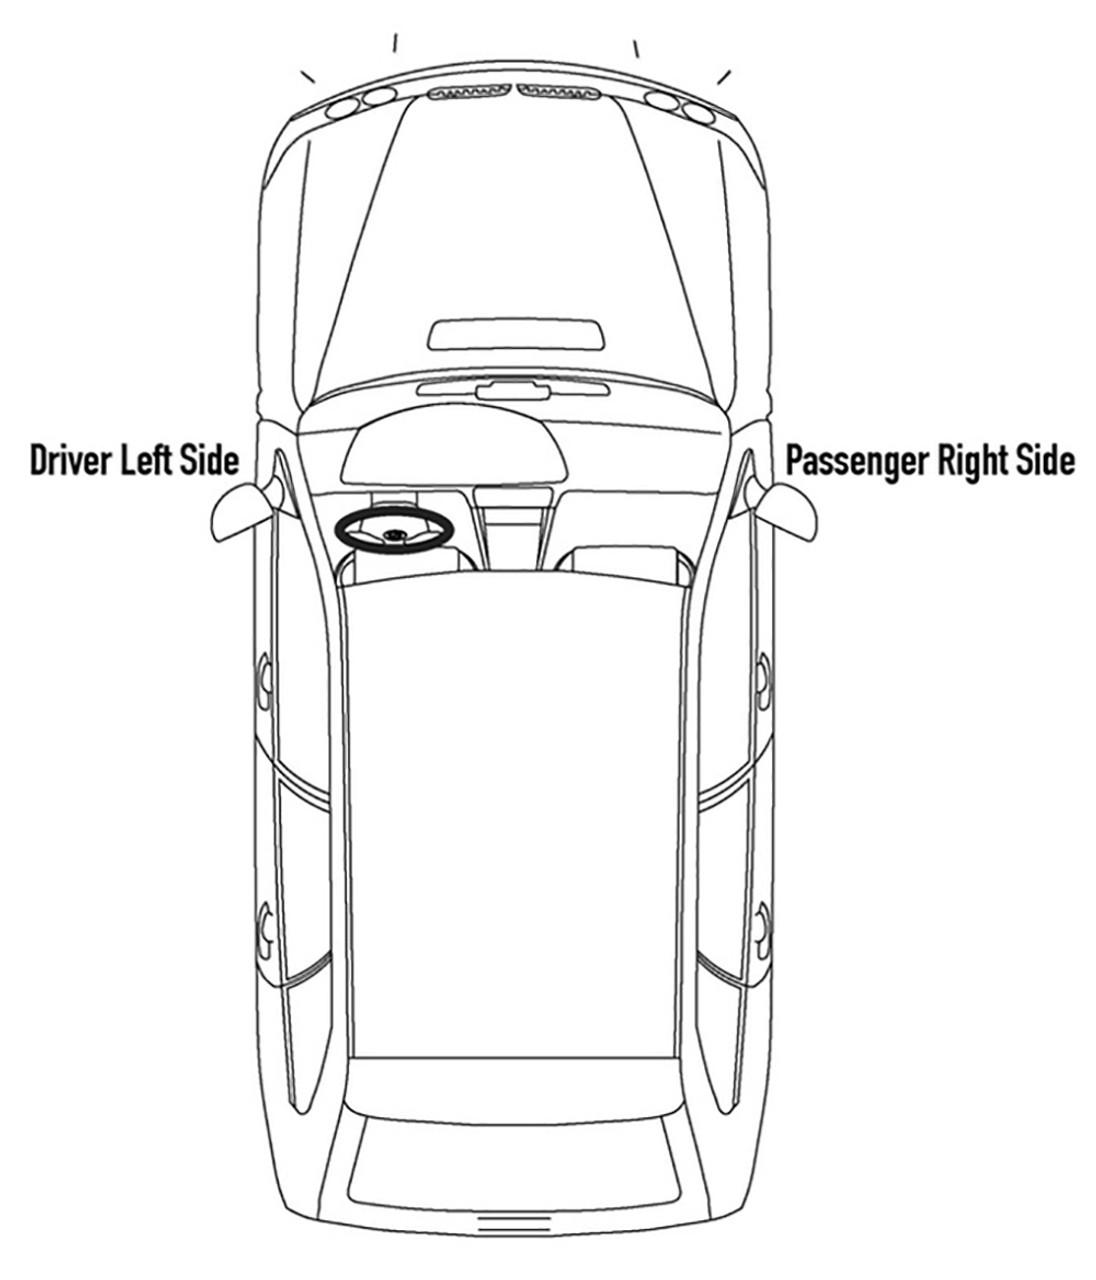 JP Auto A//C Condenser Compatible With Dodge Durango 2000 2001 2002 2003 Replacement